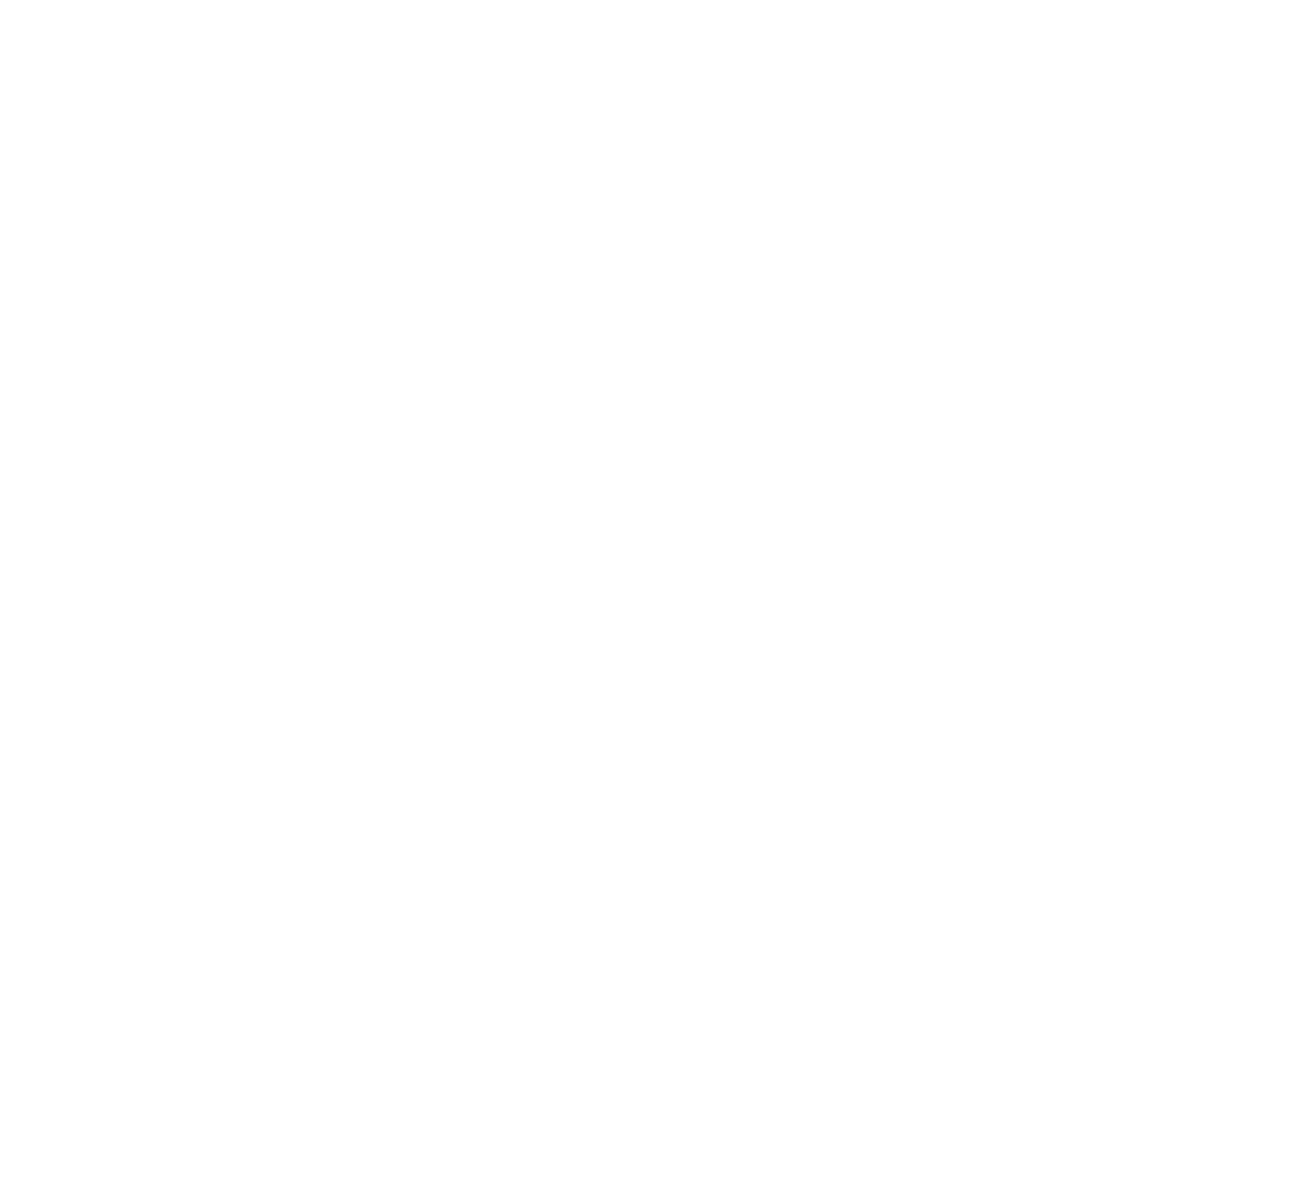 stadt ulm logo